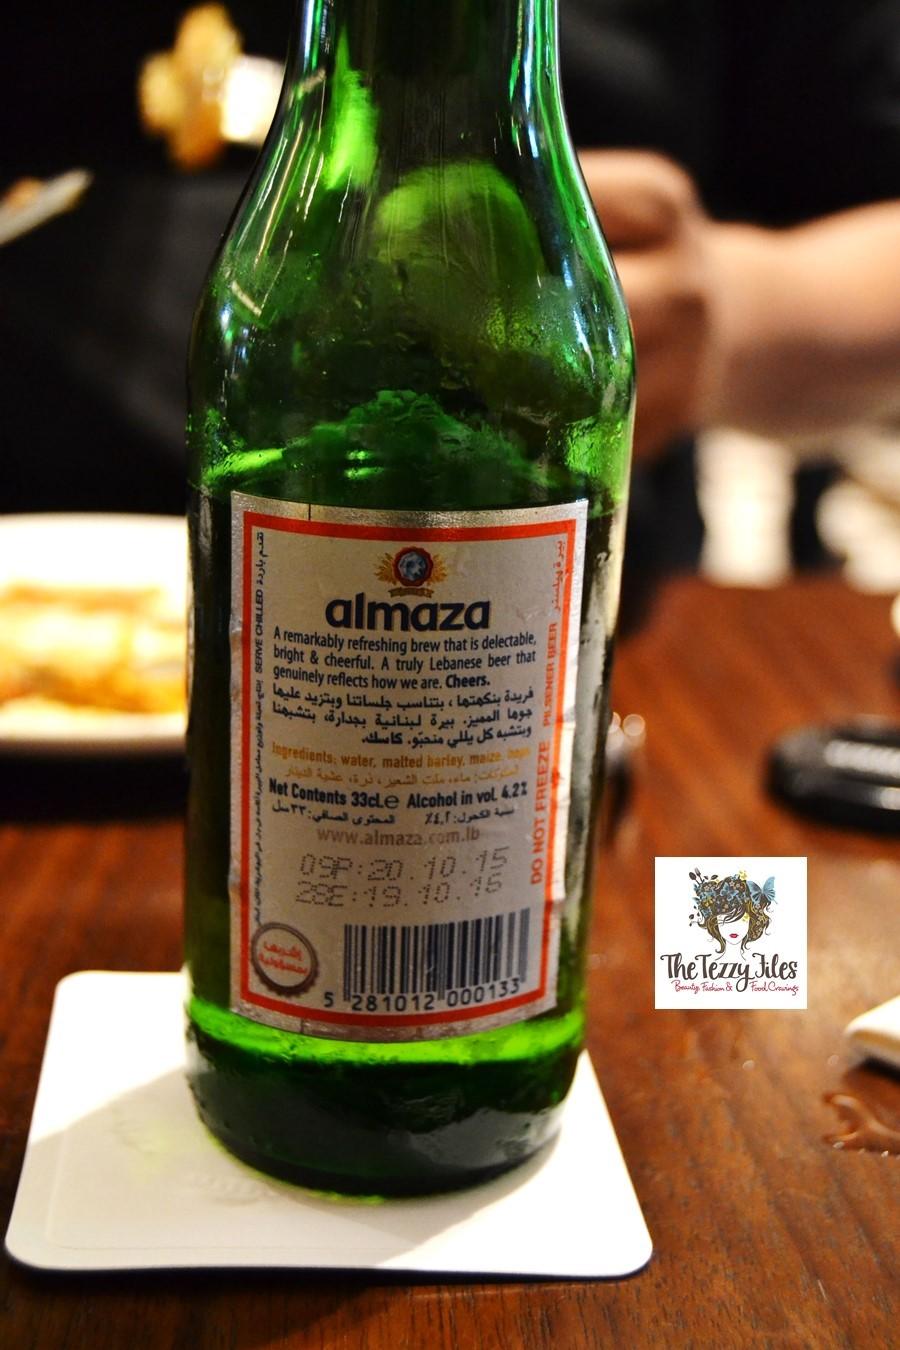 Boulevard Kitchen Manzil Downtown Dubai review on The Tezzy Files Dubai Food Blog (20)